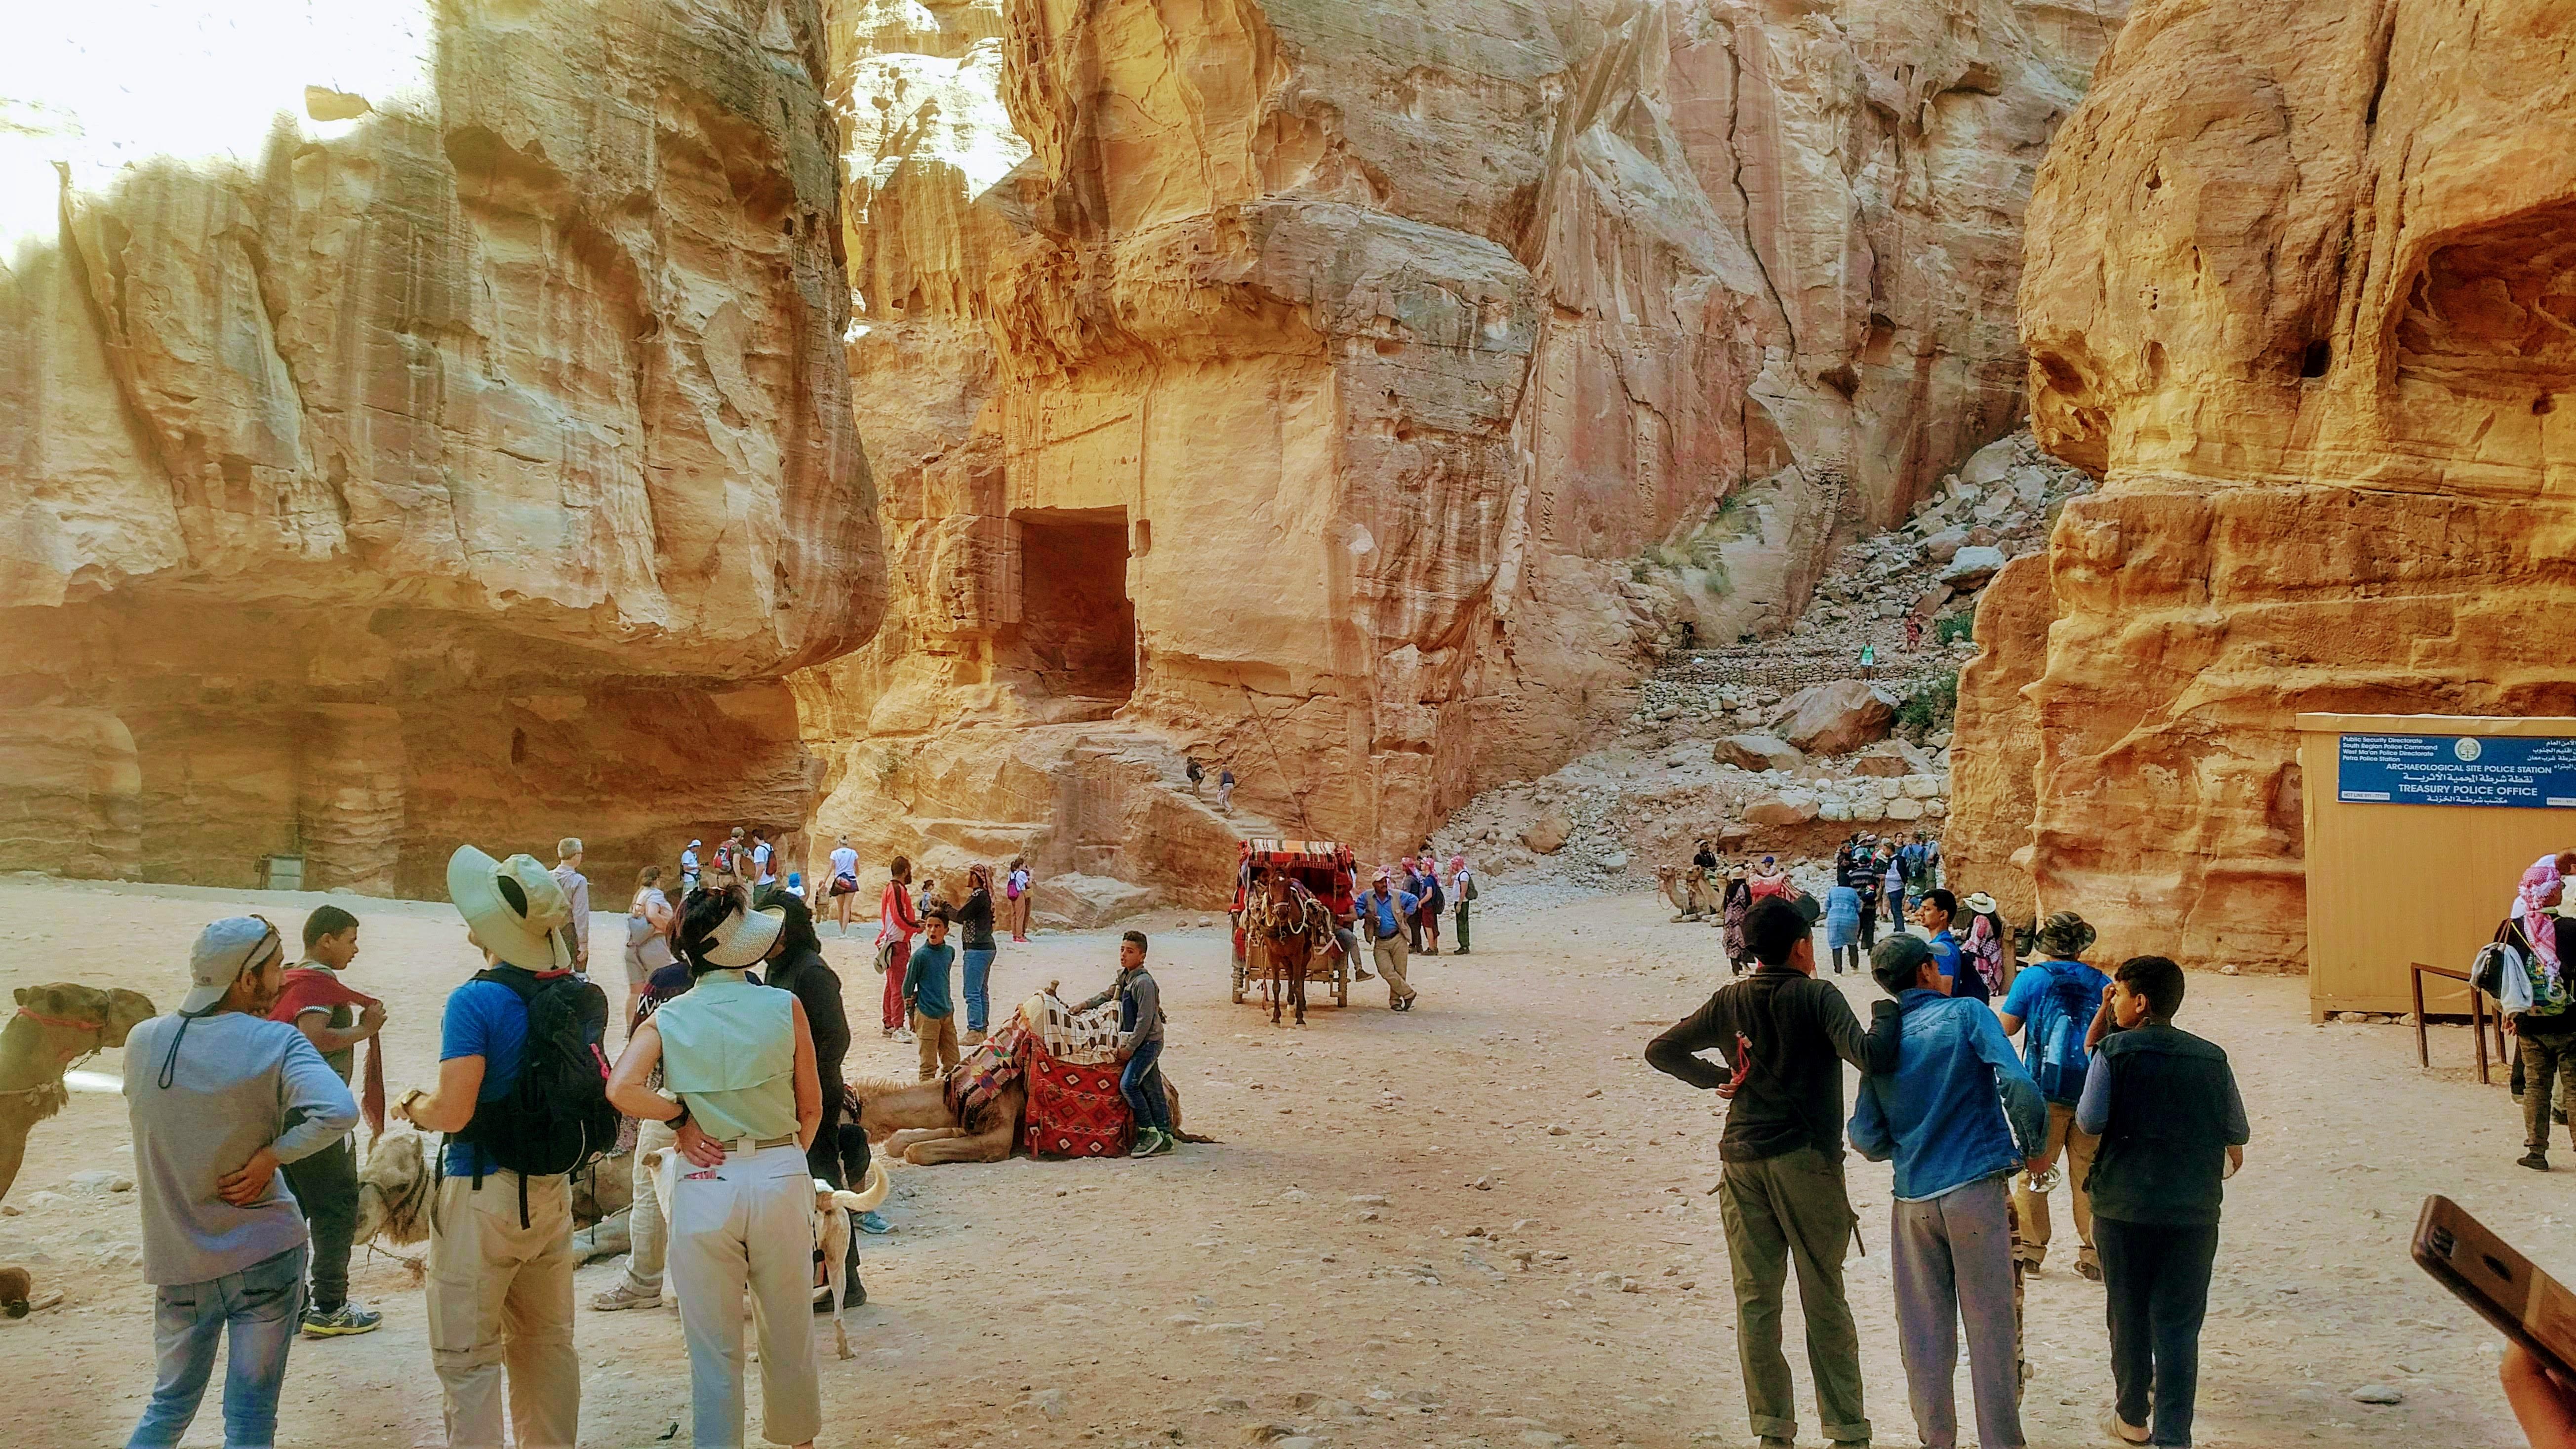 Tourism in Petra site